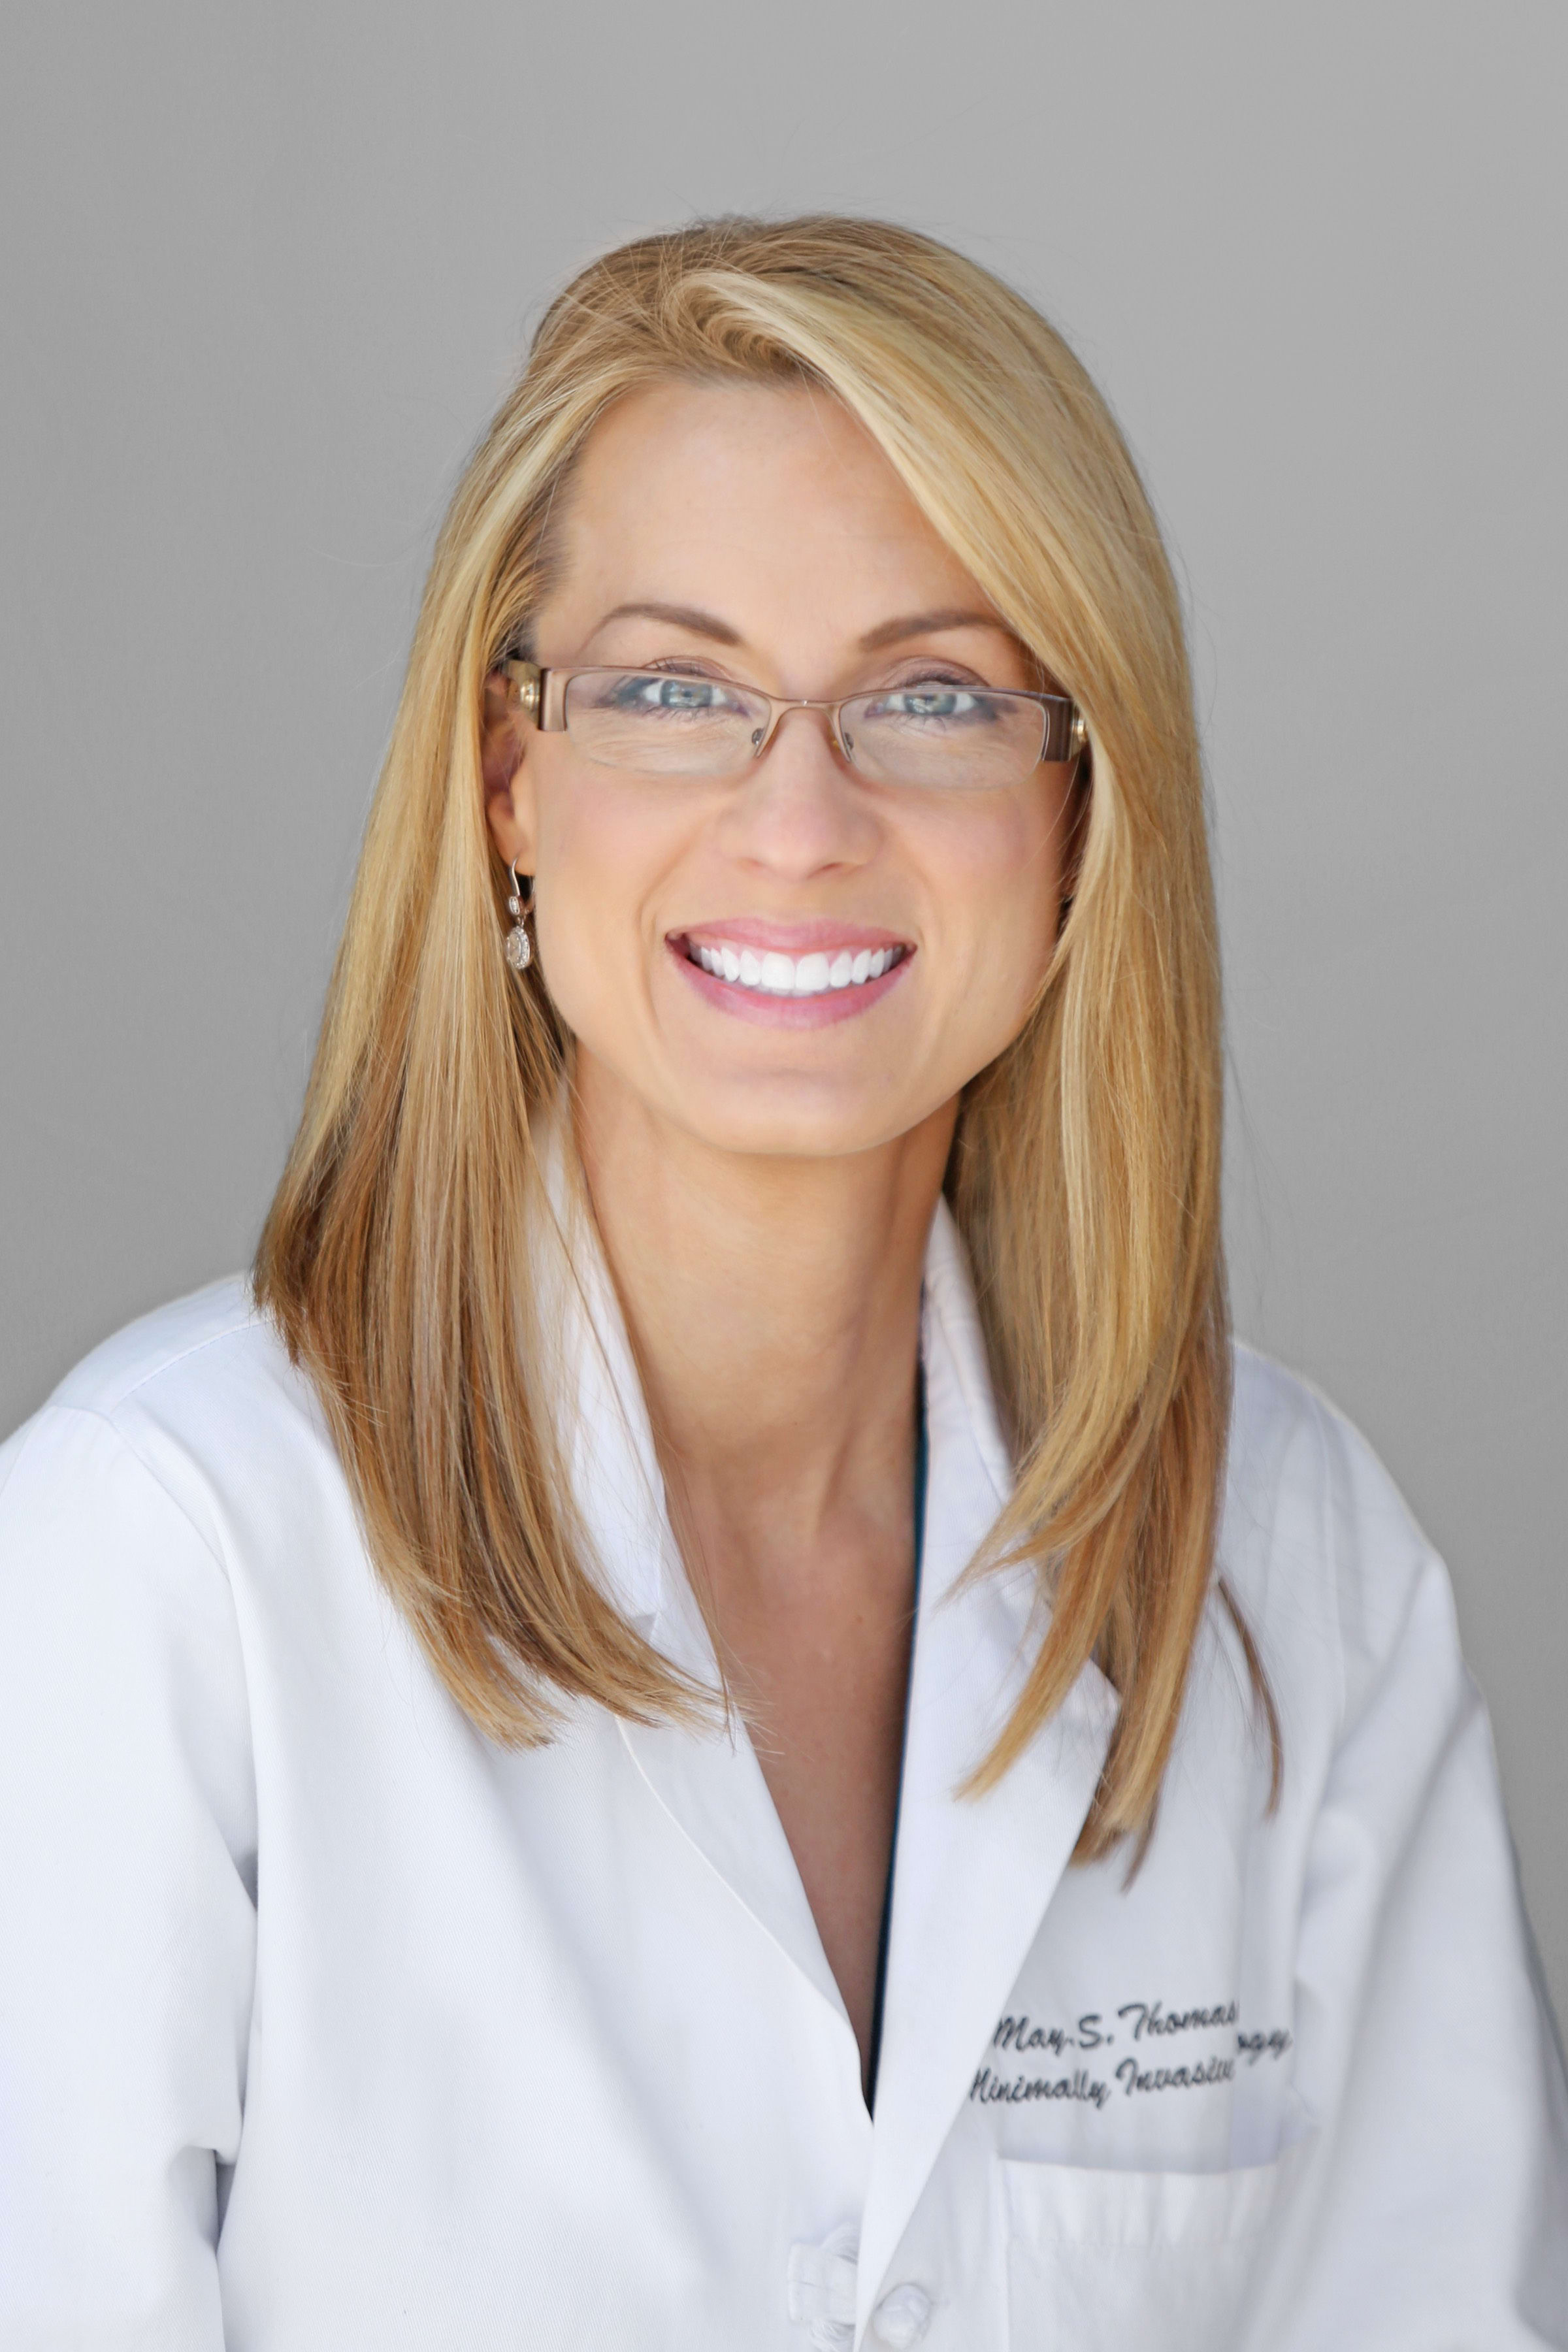 Dr. May S Thomassee MD